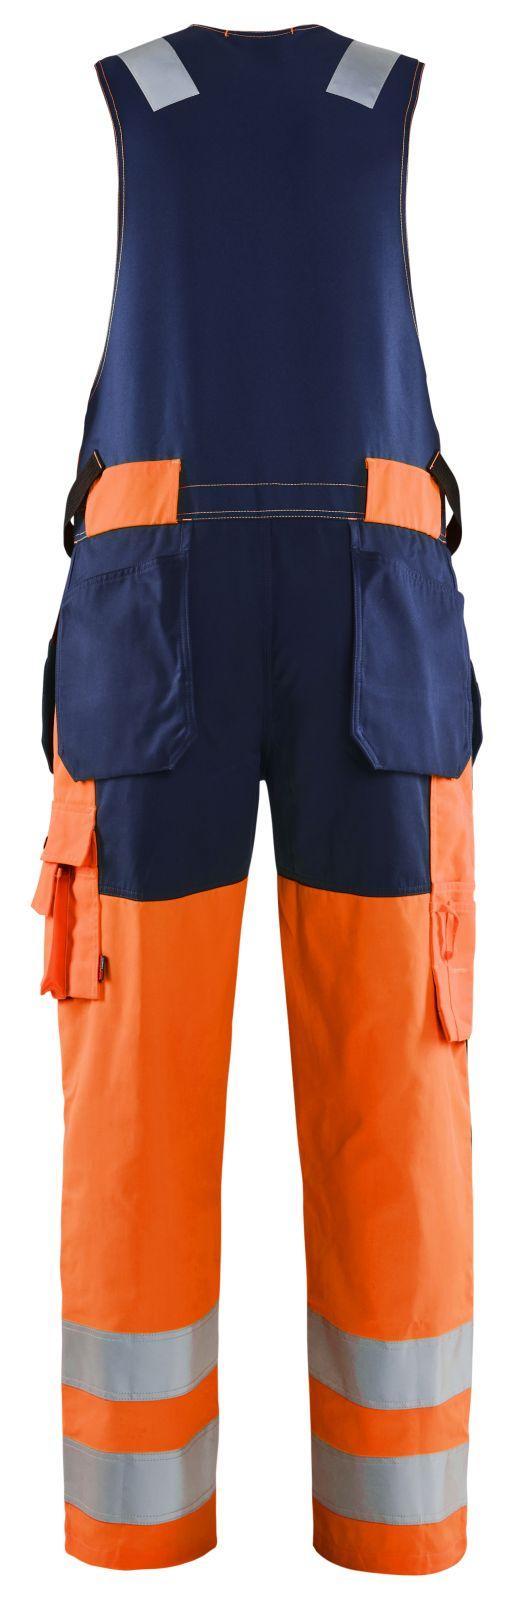 Blaklader Bodybroeken 26531804 High Vis oranje-marineblauw(5389)